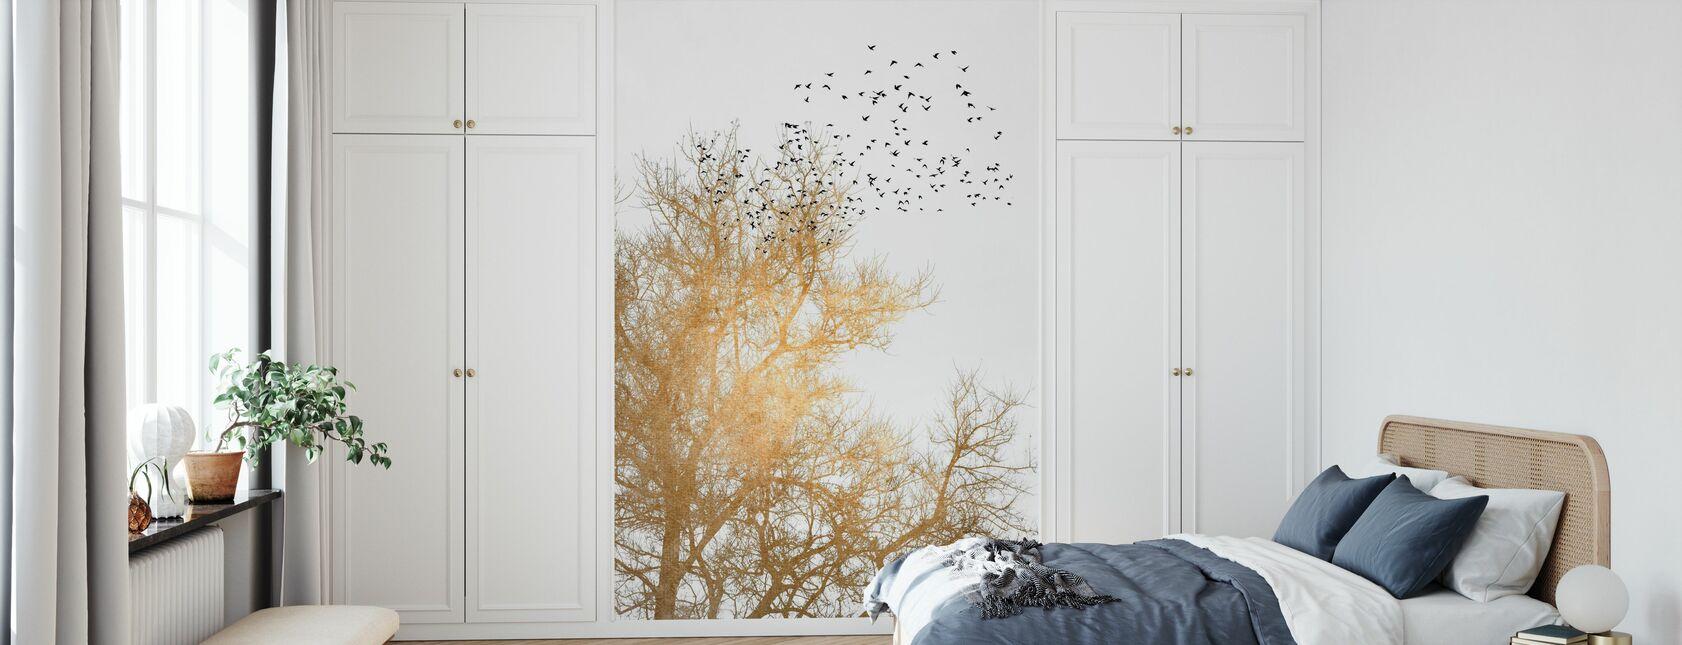 Gyldne himmel - Tapet - Soveværelse